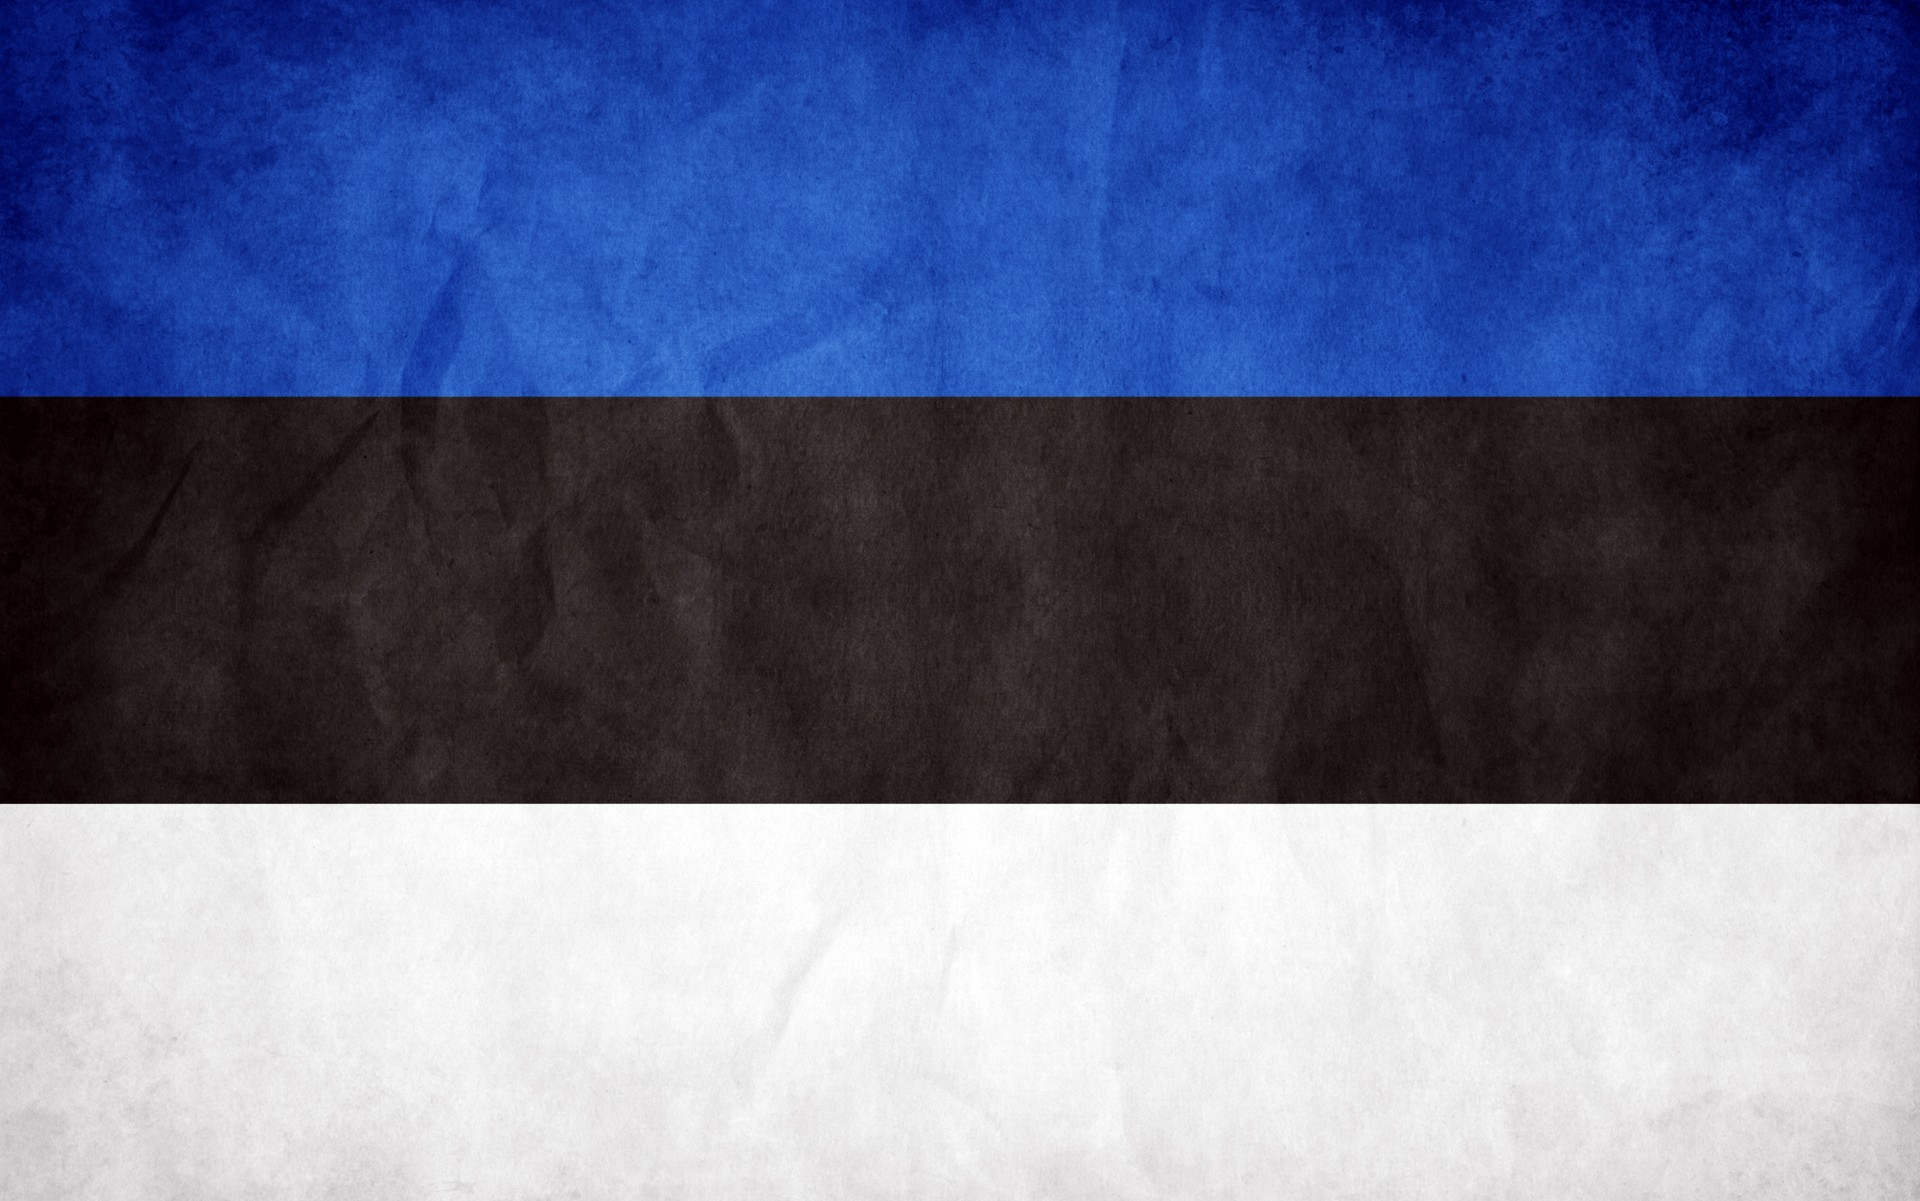 Estonia Flag Wallpaper 51632 1920x1201px 1920x1201